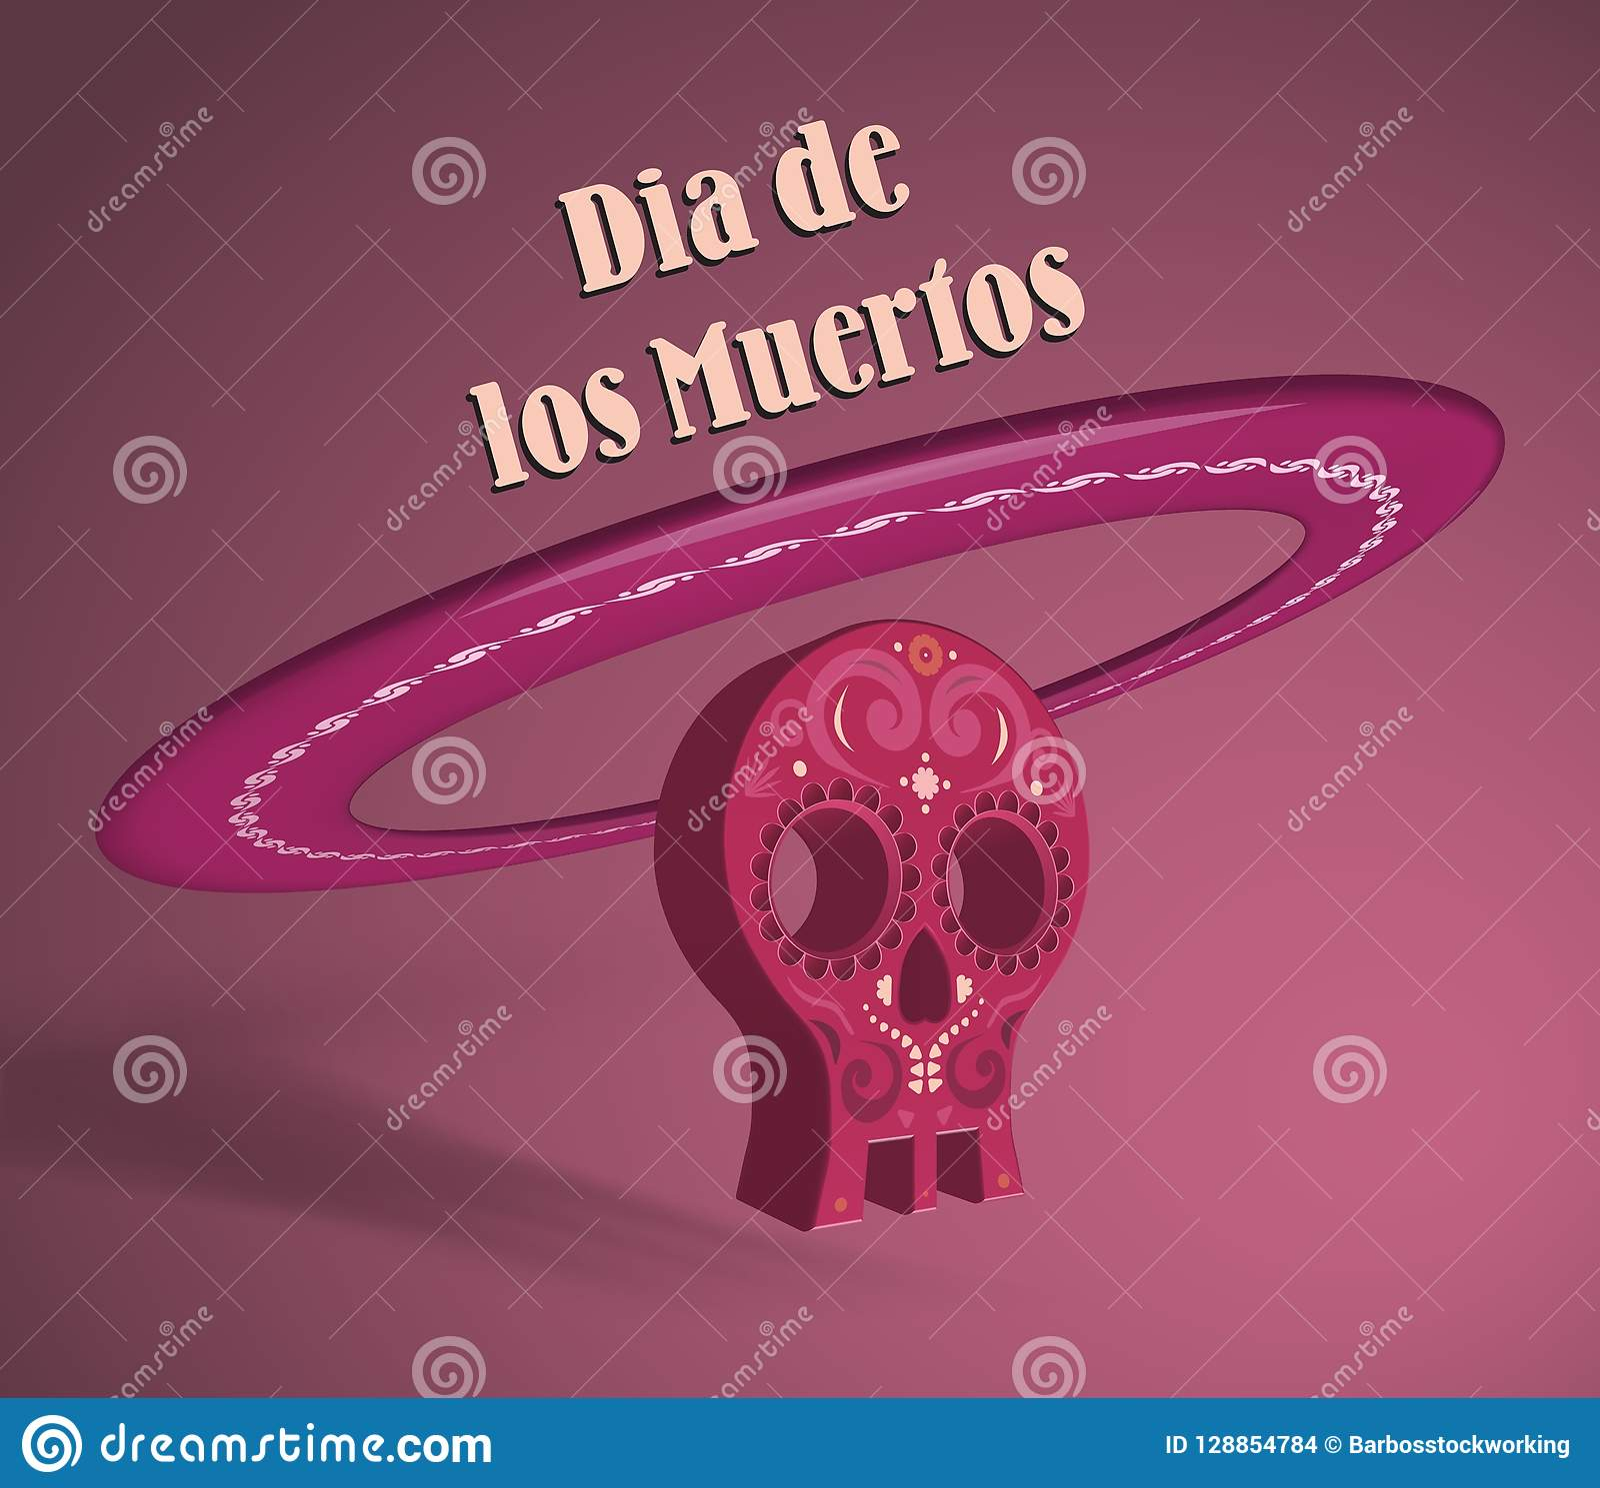 3d object symbolizing skull and sombrero hat